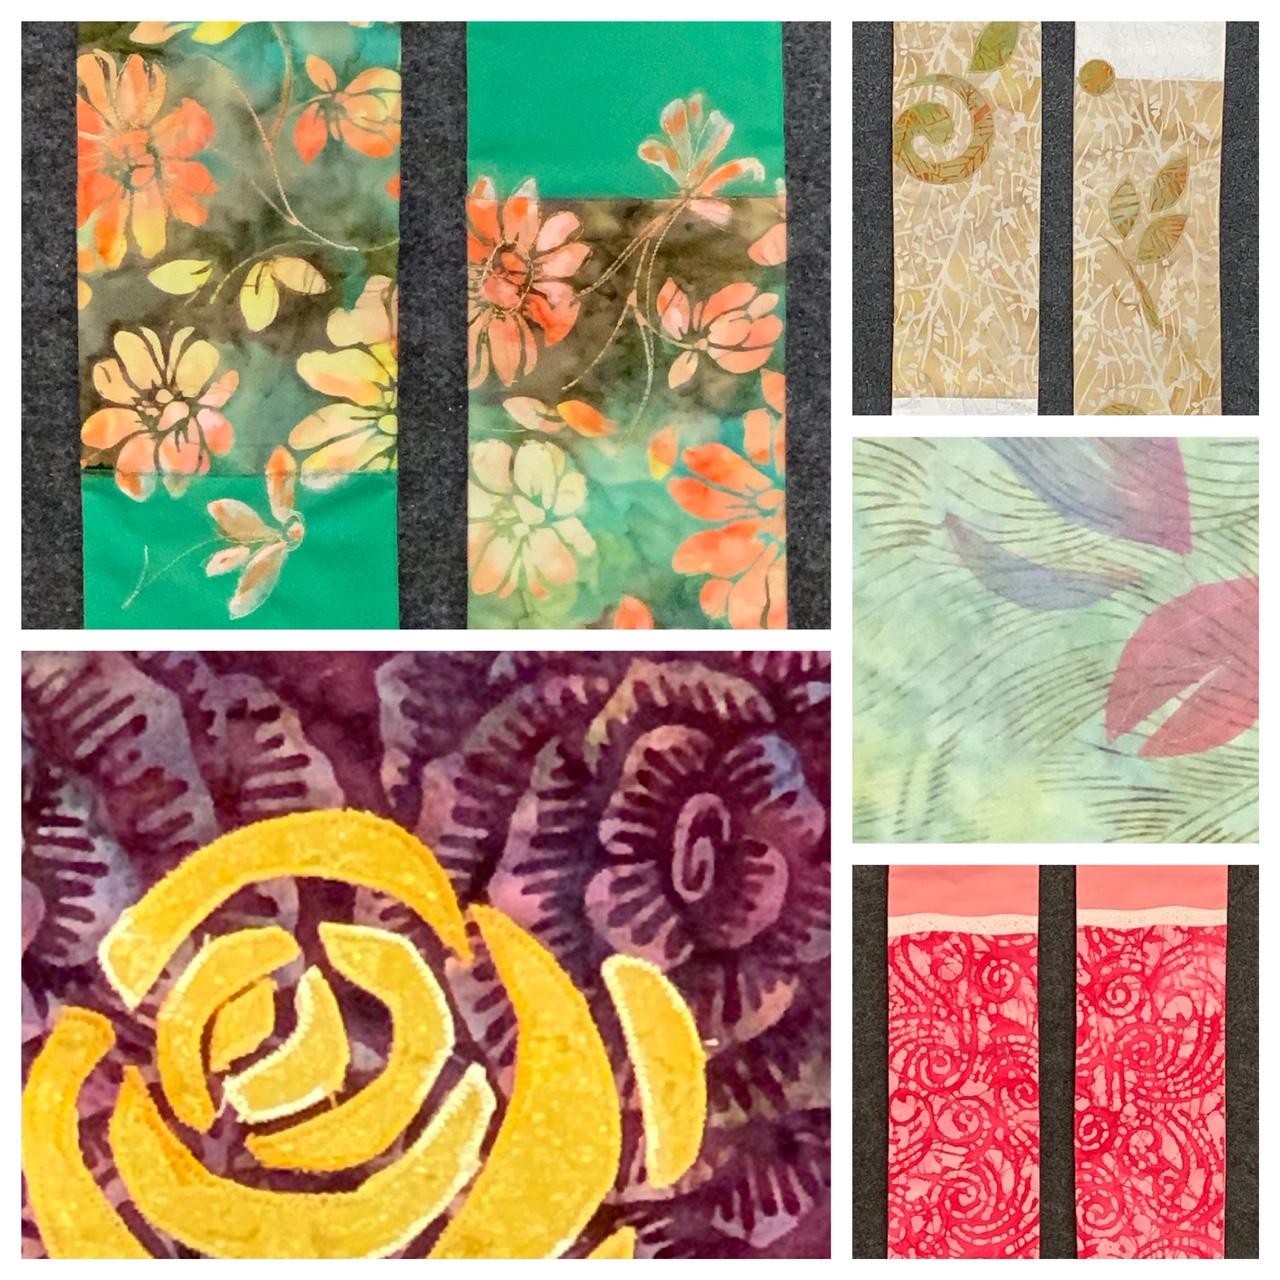 2019.7.31 Carrot Top Studio clergy stoles - batik fabrics.jpg